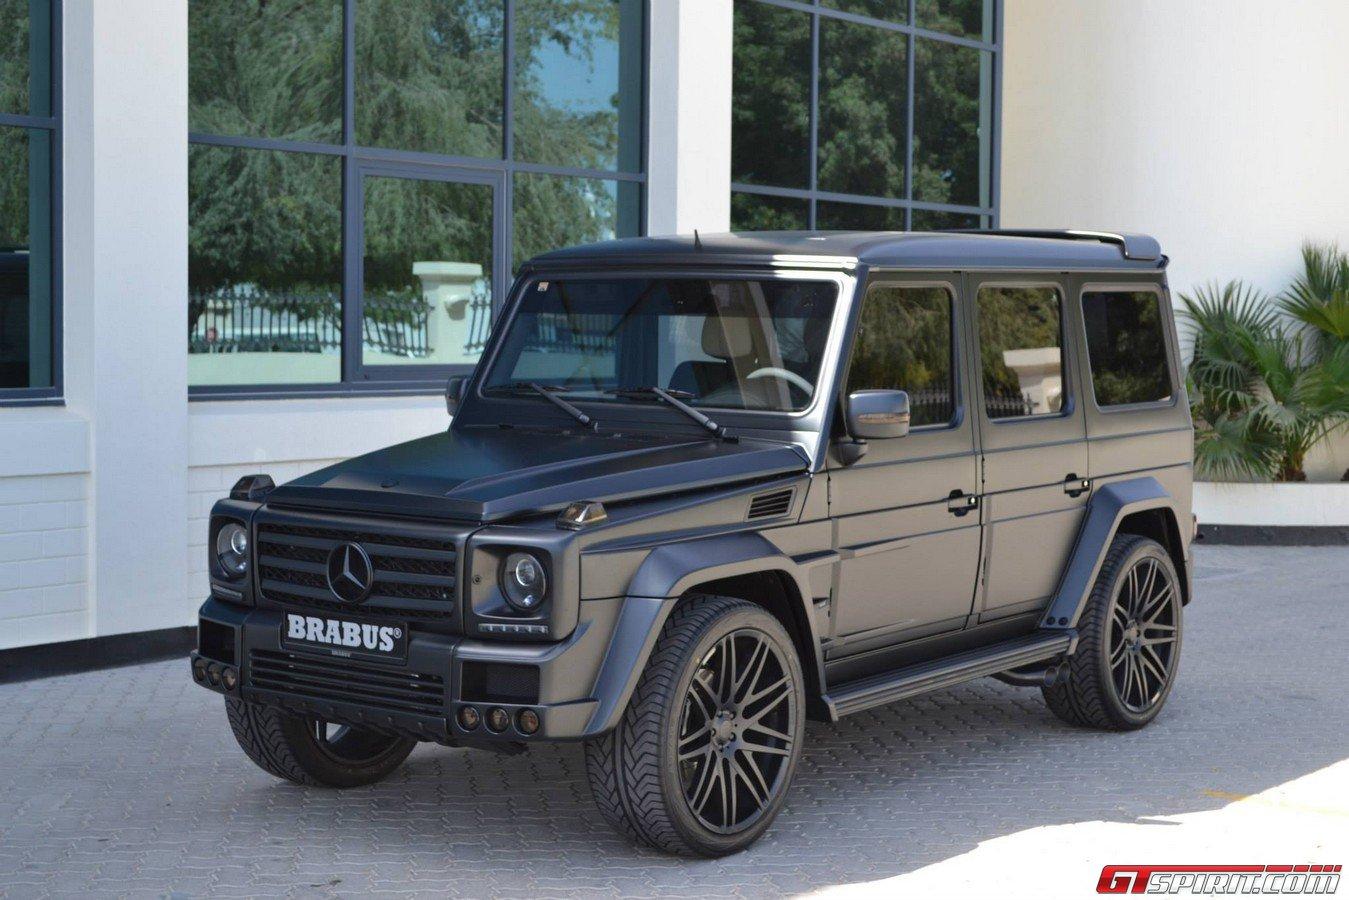 Gallery matte black brabus widestar g55 amg in saudi for Mercedes benz g class black